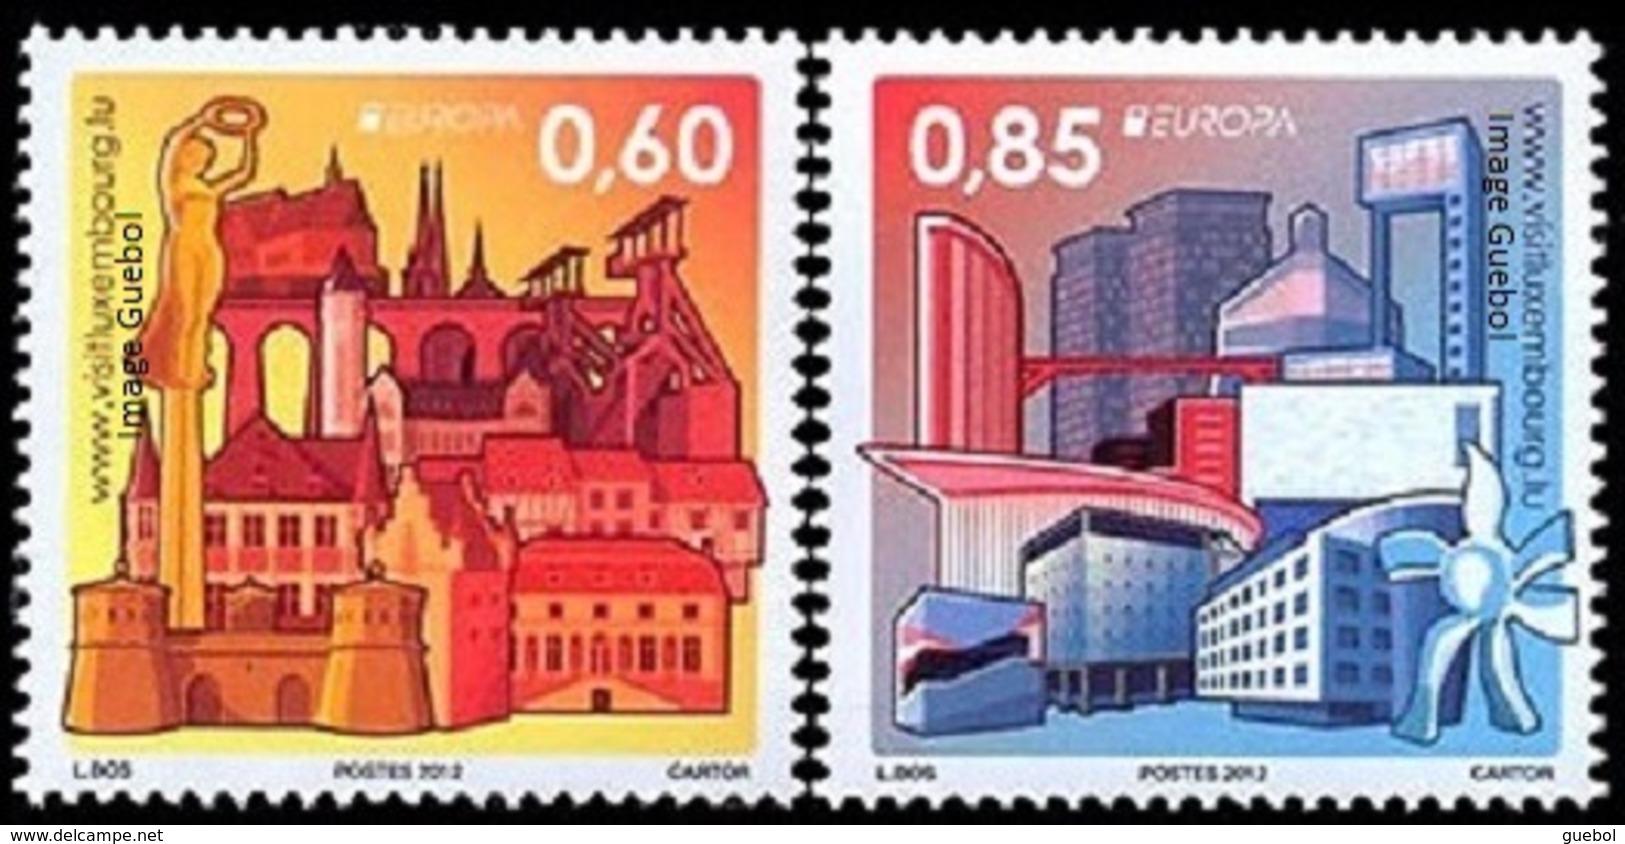 CEPT / Europa 2012 Luxembourg N° 1848 Et 1849 ** Tourisme - 2012